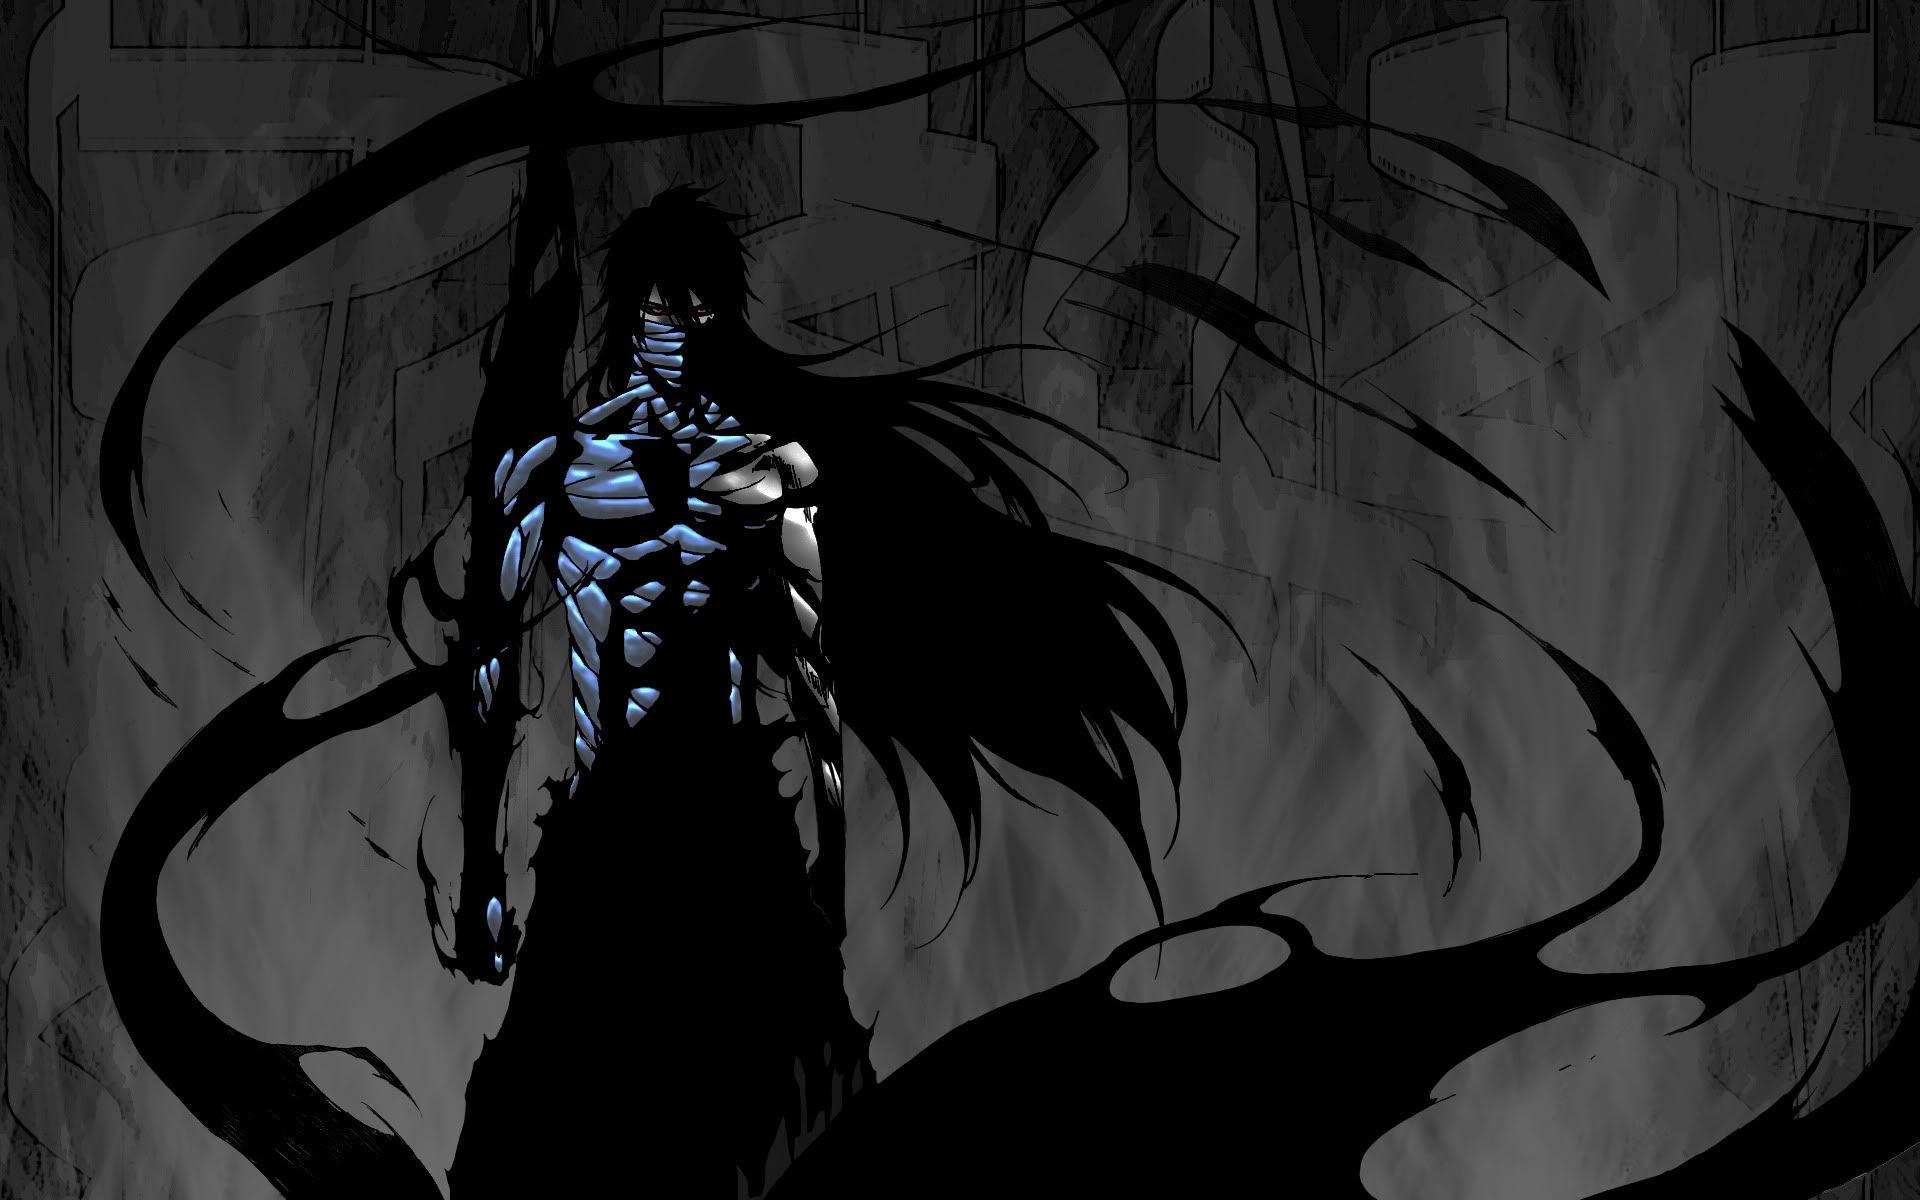 bleach hallow wallpaper anime Dark anime, Anime